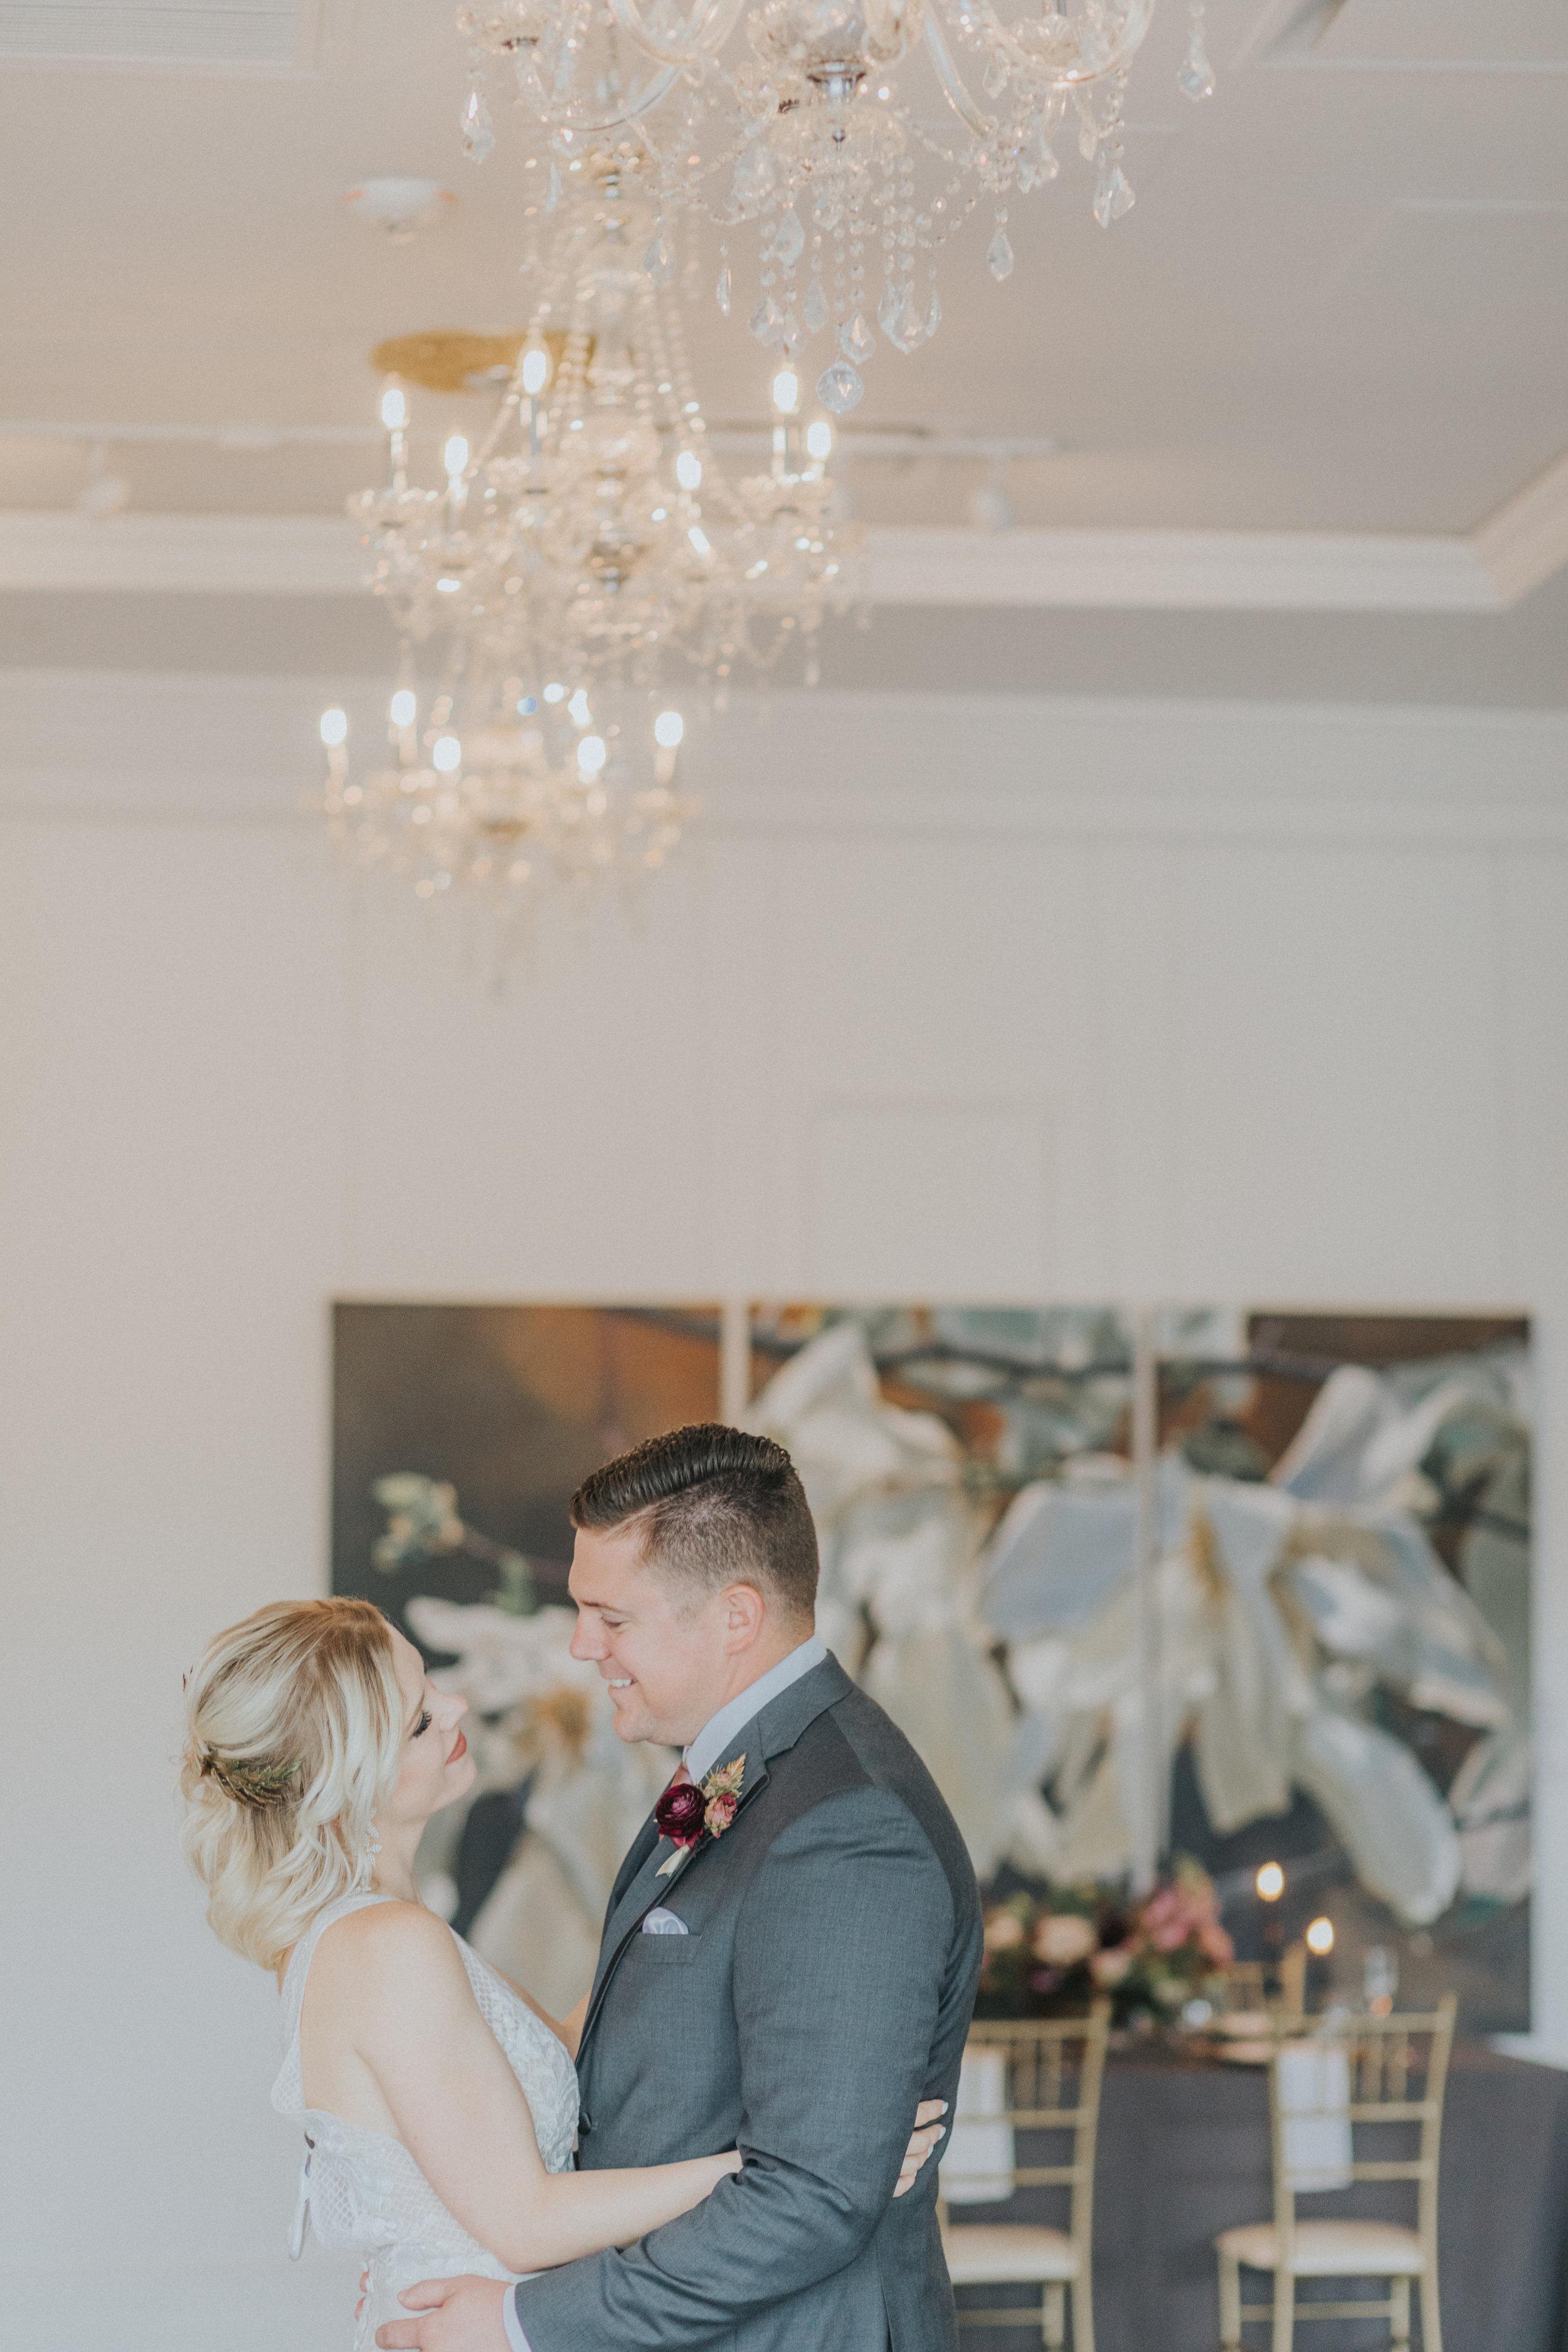 159 tiny-luxe-weddings-omaha-nebraska-midwest-empire-room.jpg